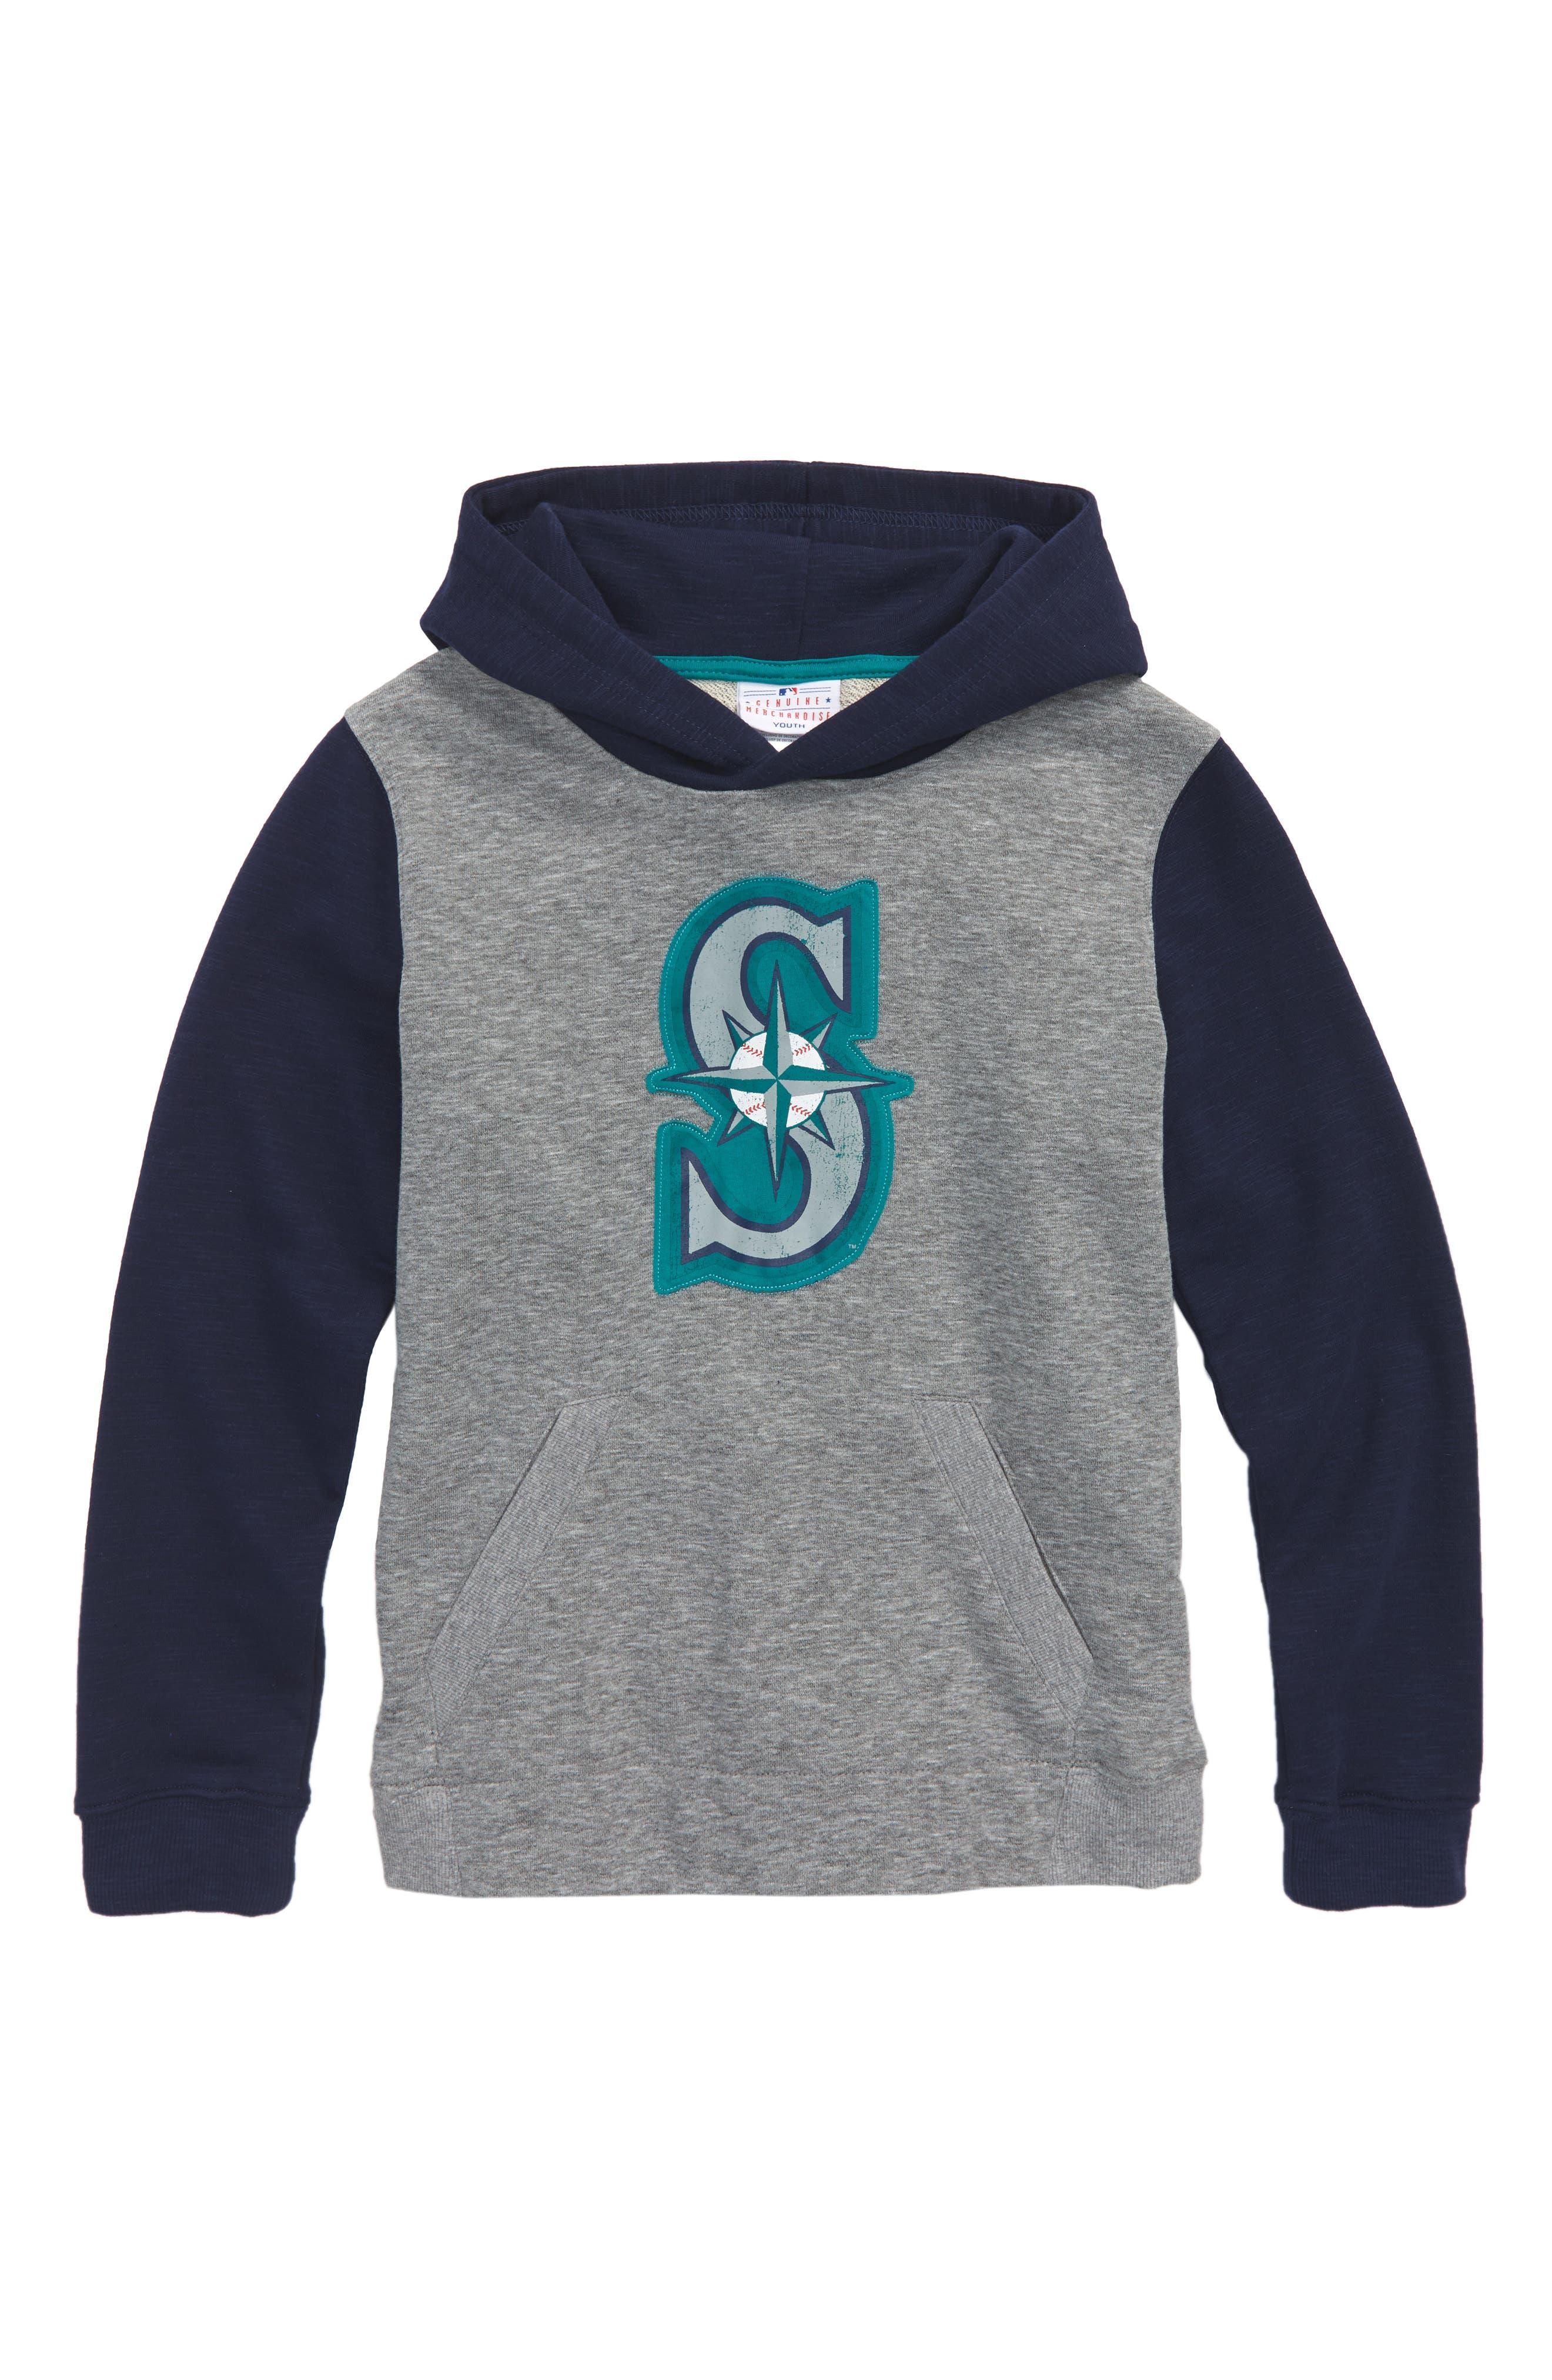 New Beginnings - Seattle Mariners Pullover Hoodie,                         Main,                         color, 020